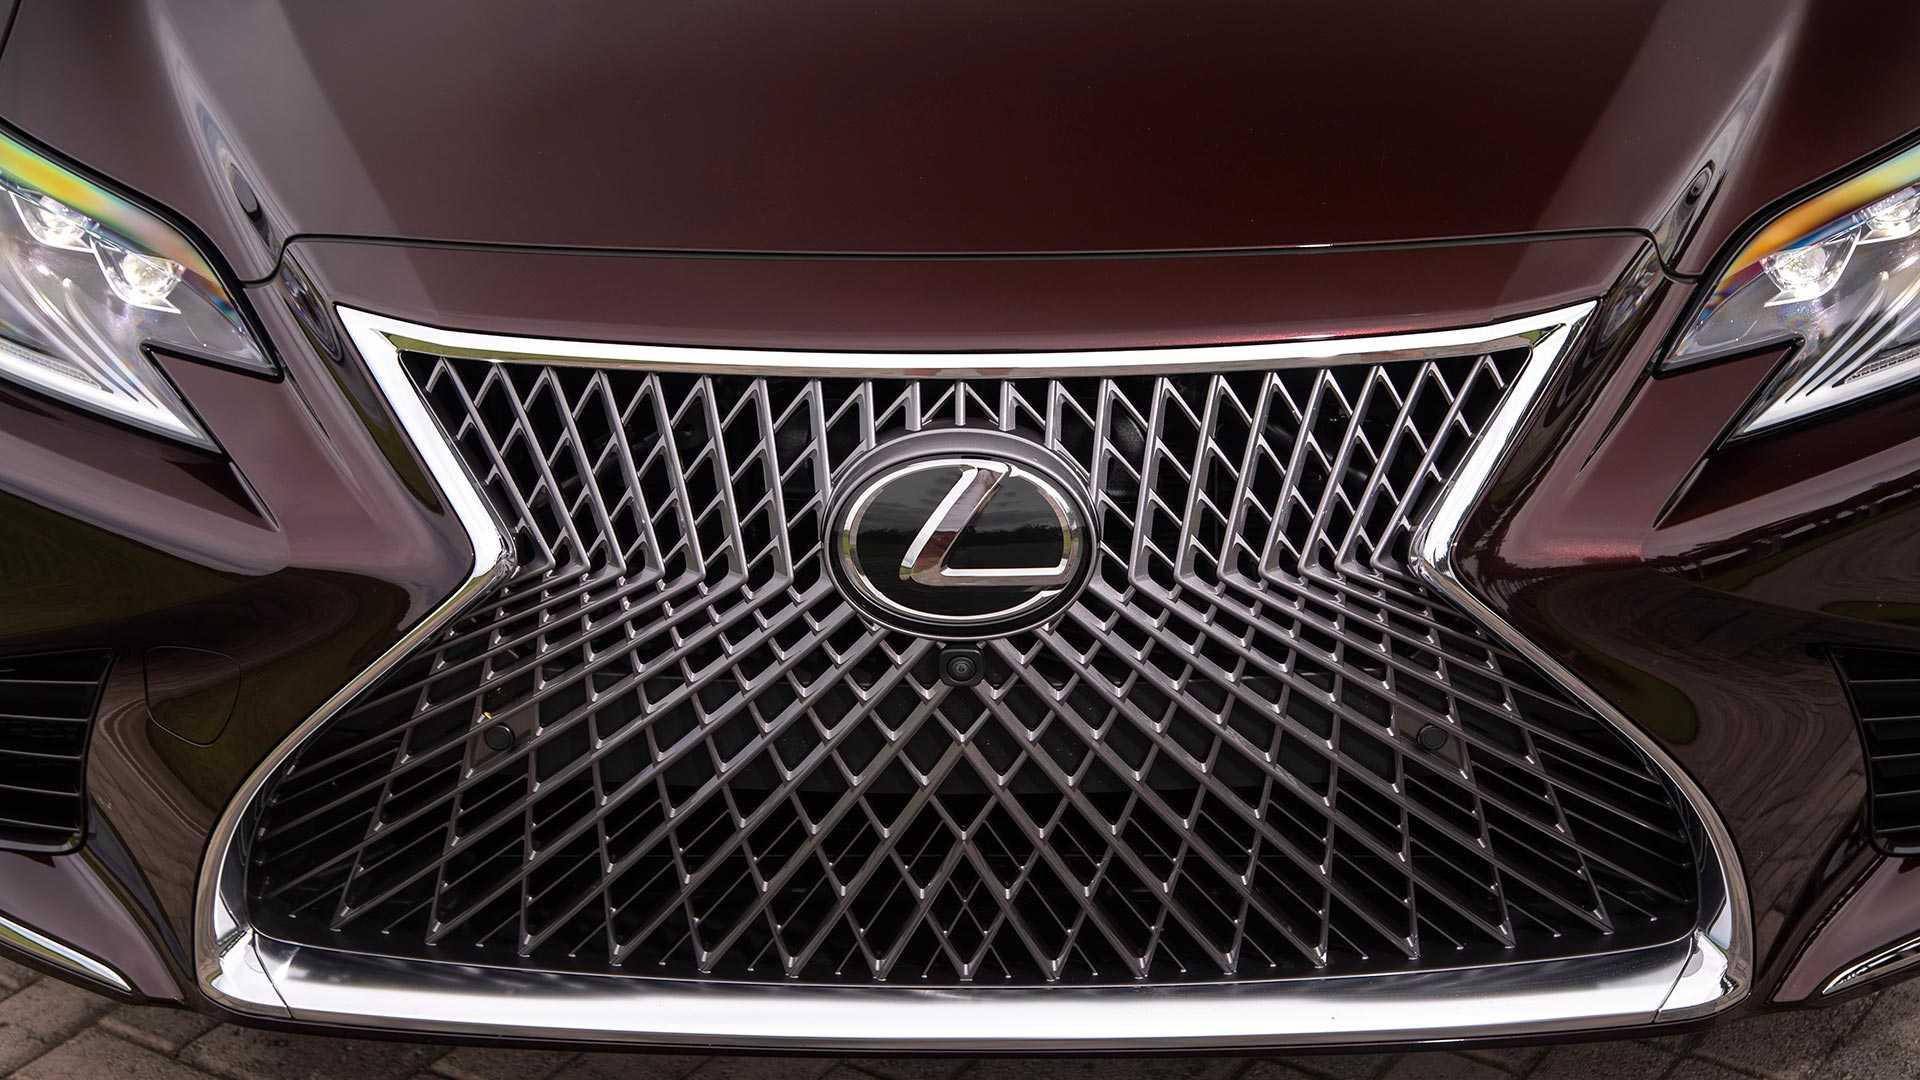 2020 Lexus LS 500 Inspiration Series Grill Wallpapers (9)